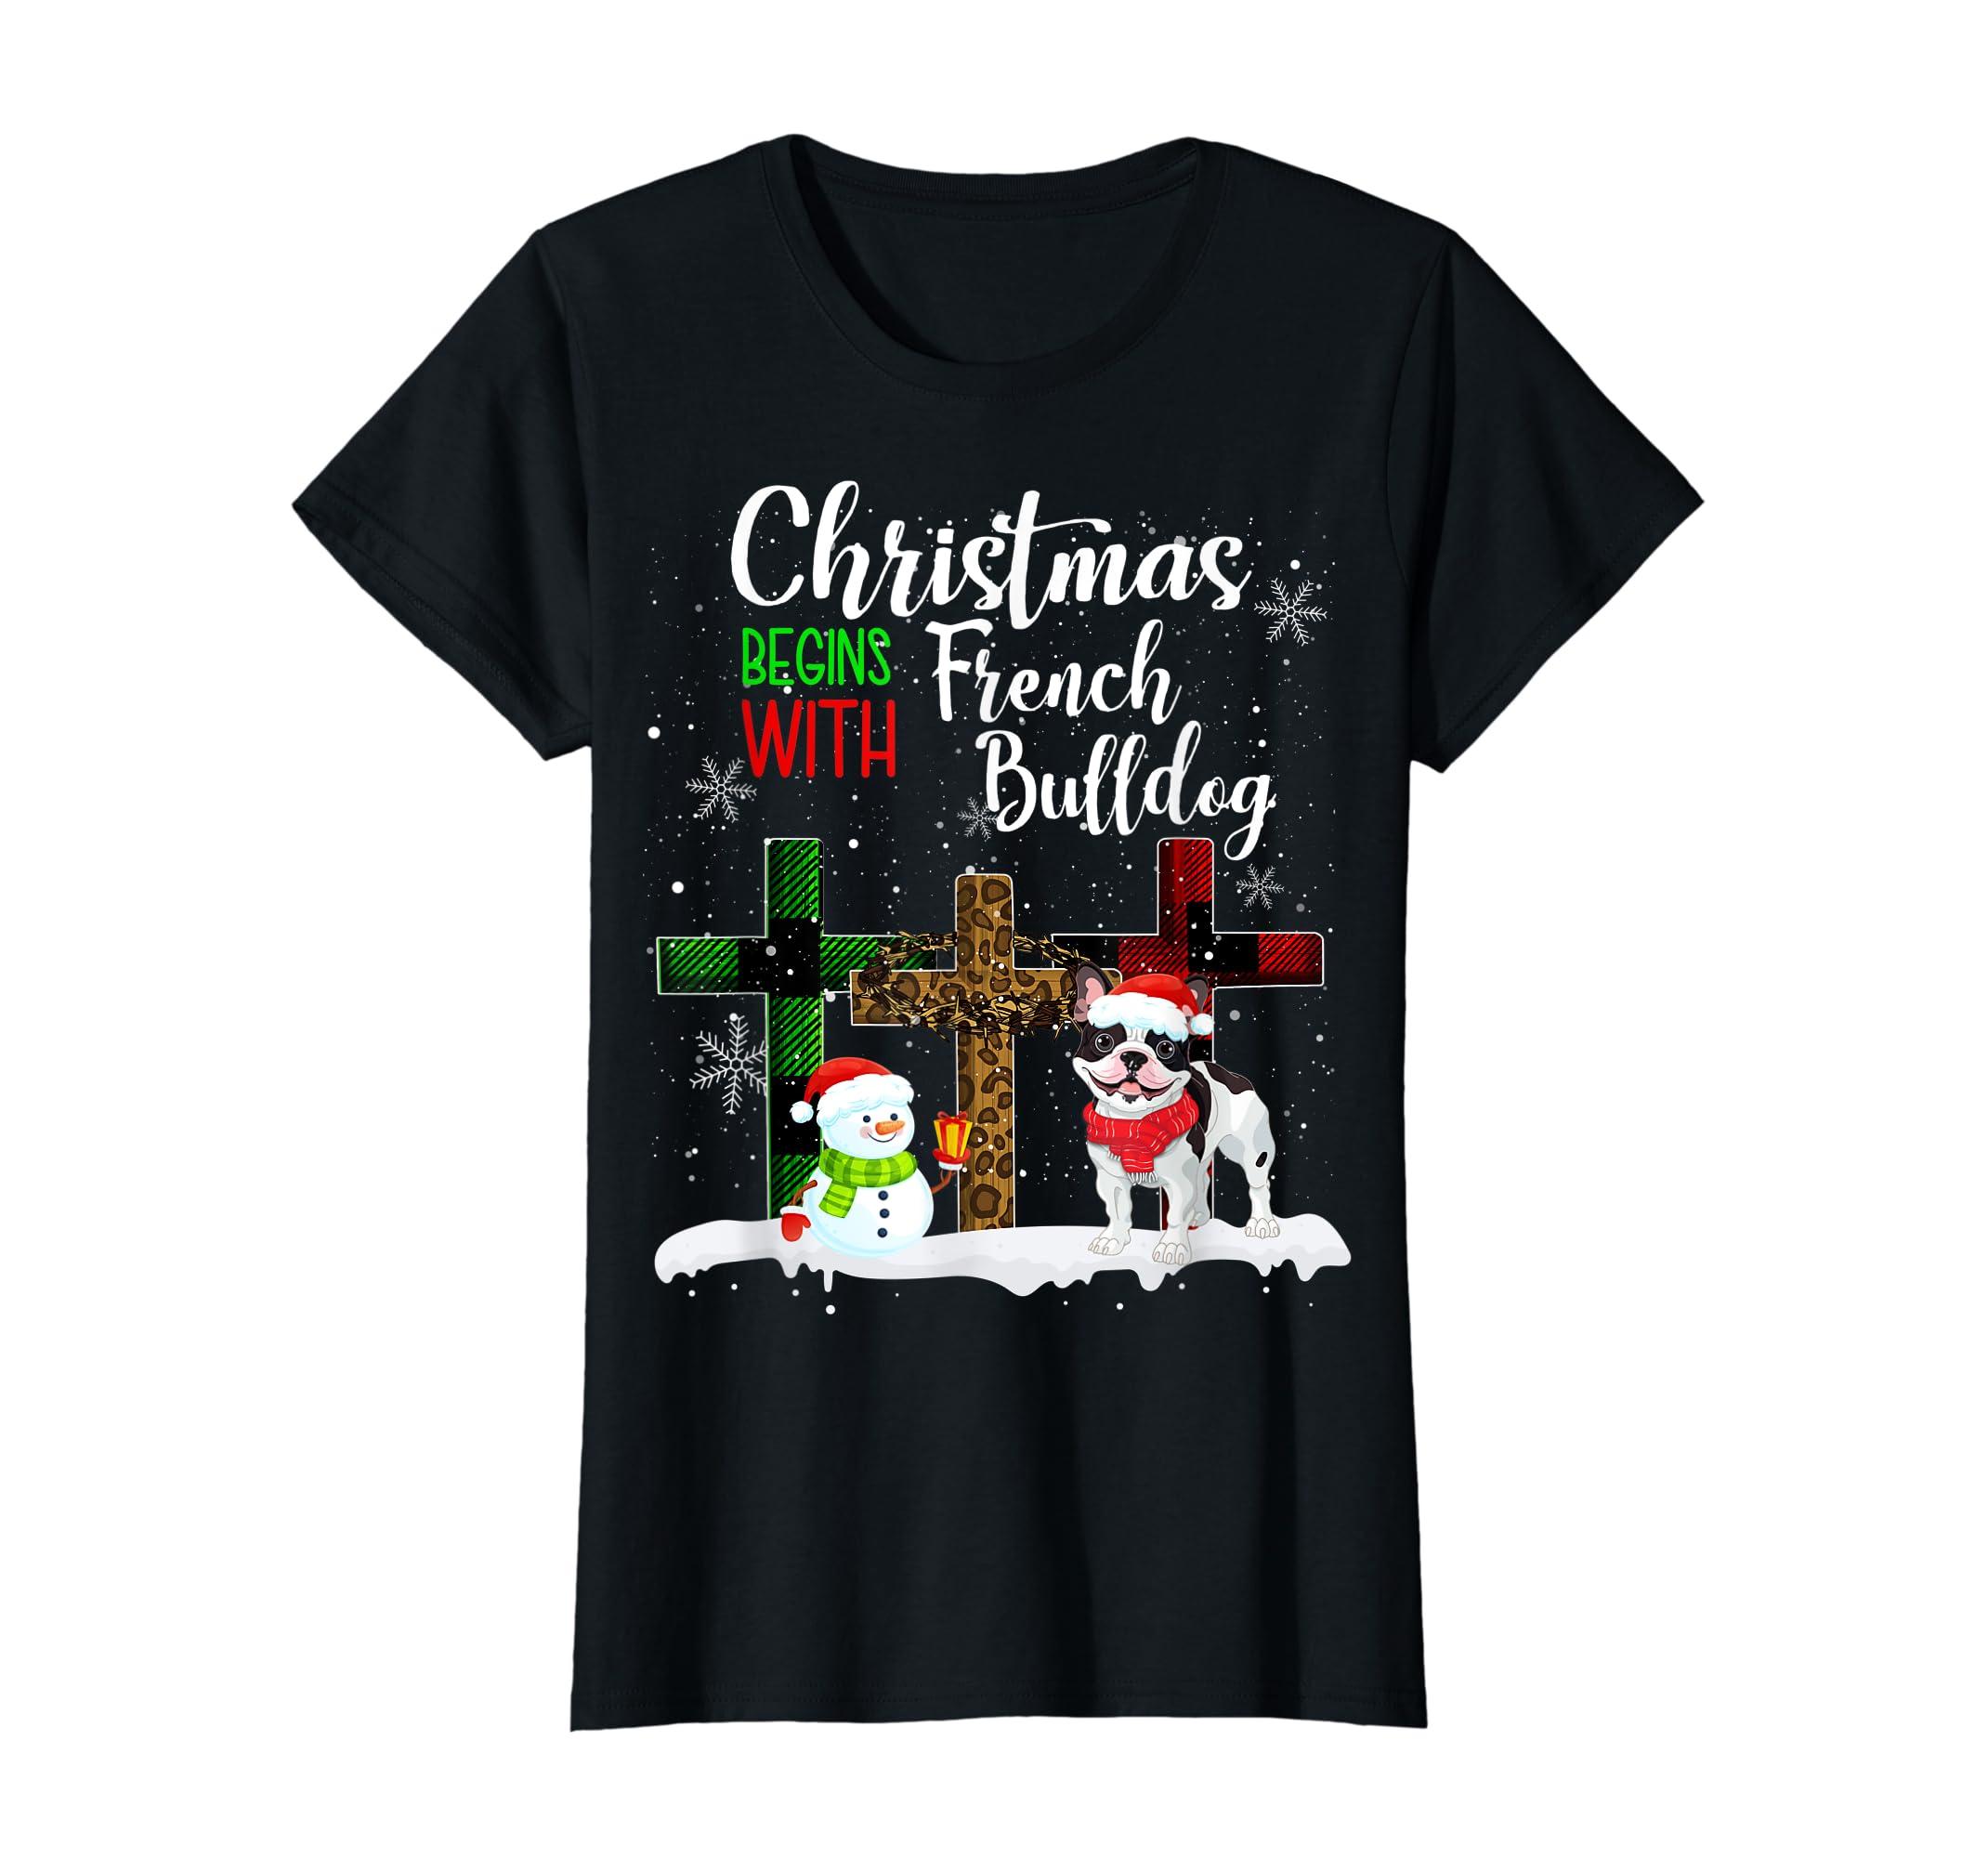 Christmas Begins With French Bulldog Costume Xmas Gifts T-Shirt-Women's T-Shirt-Black